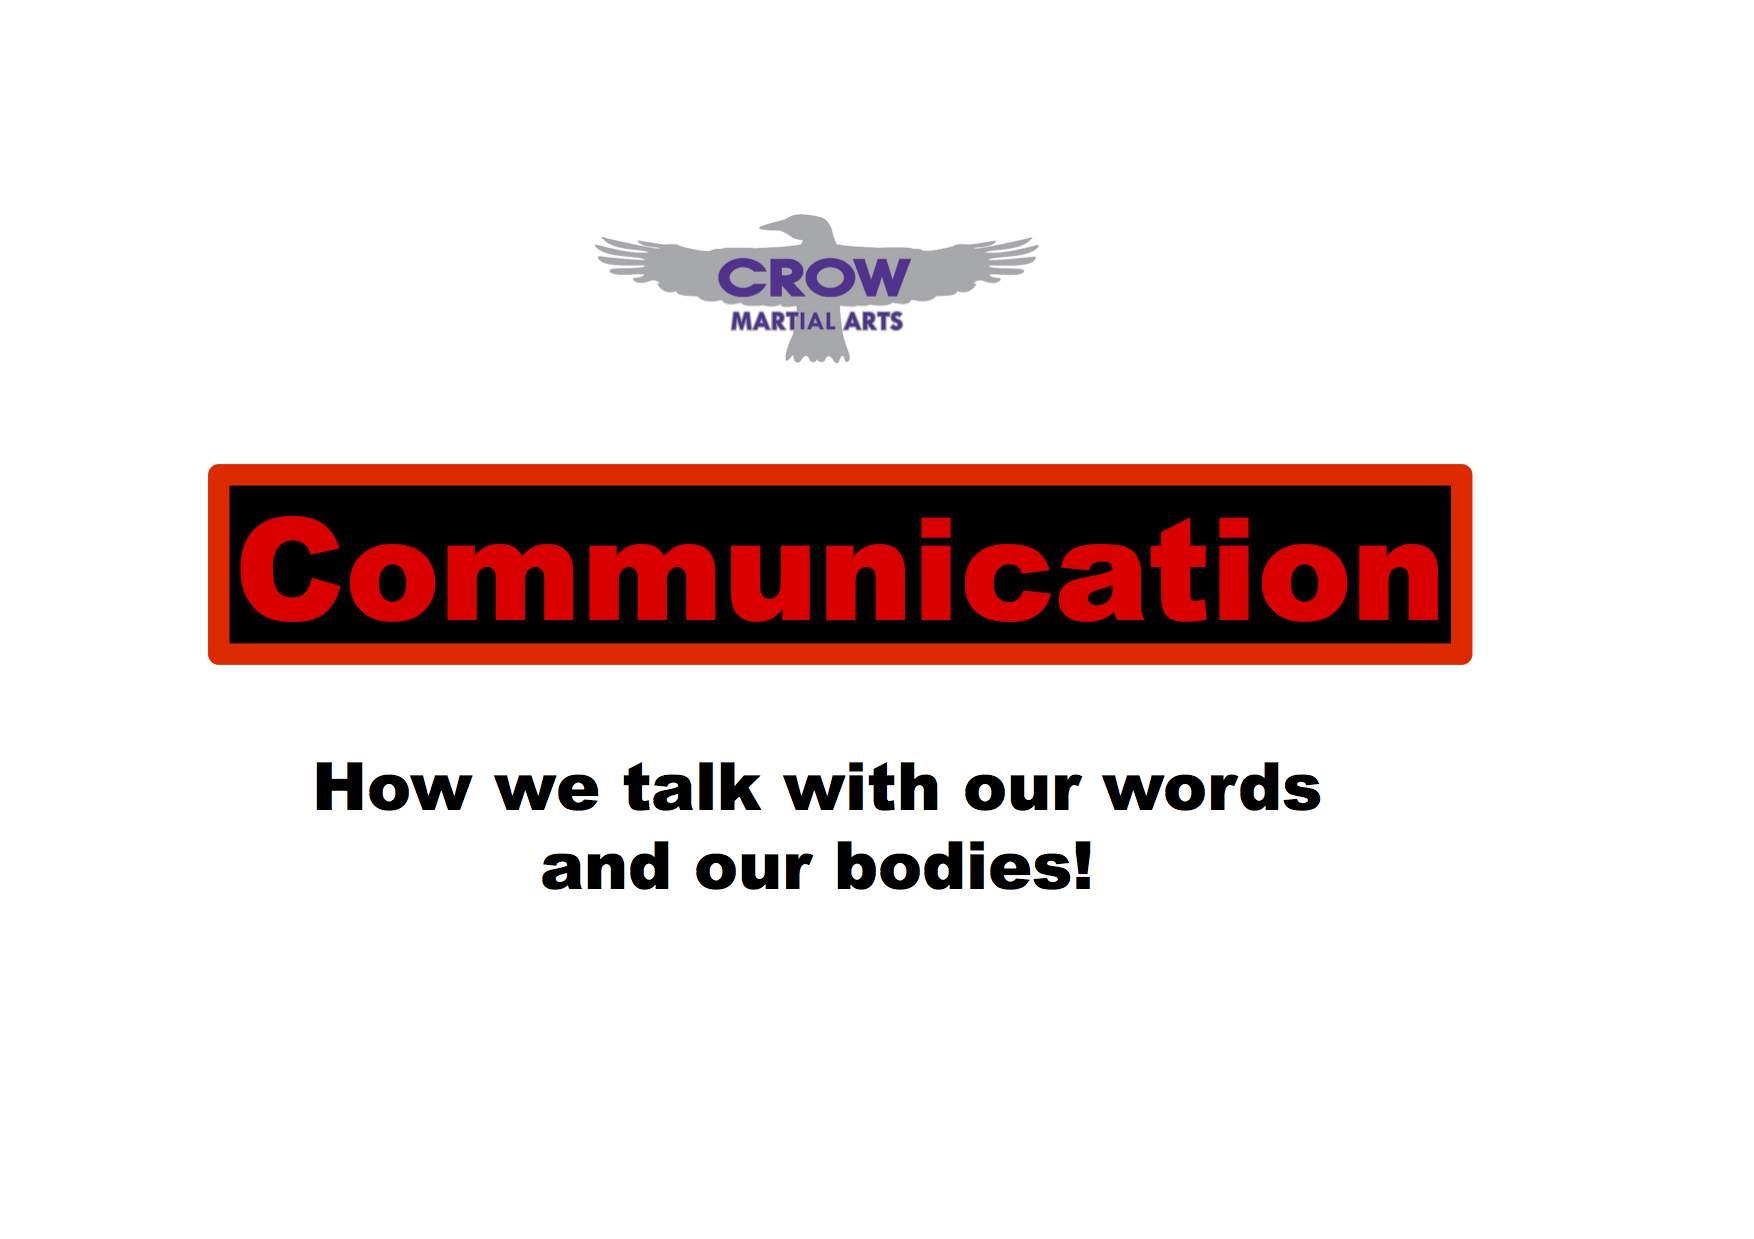 Crow Martial Arts - Life skill program